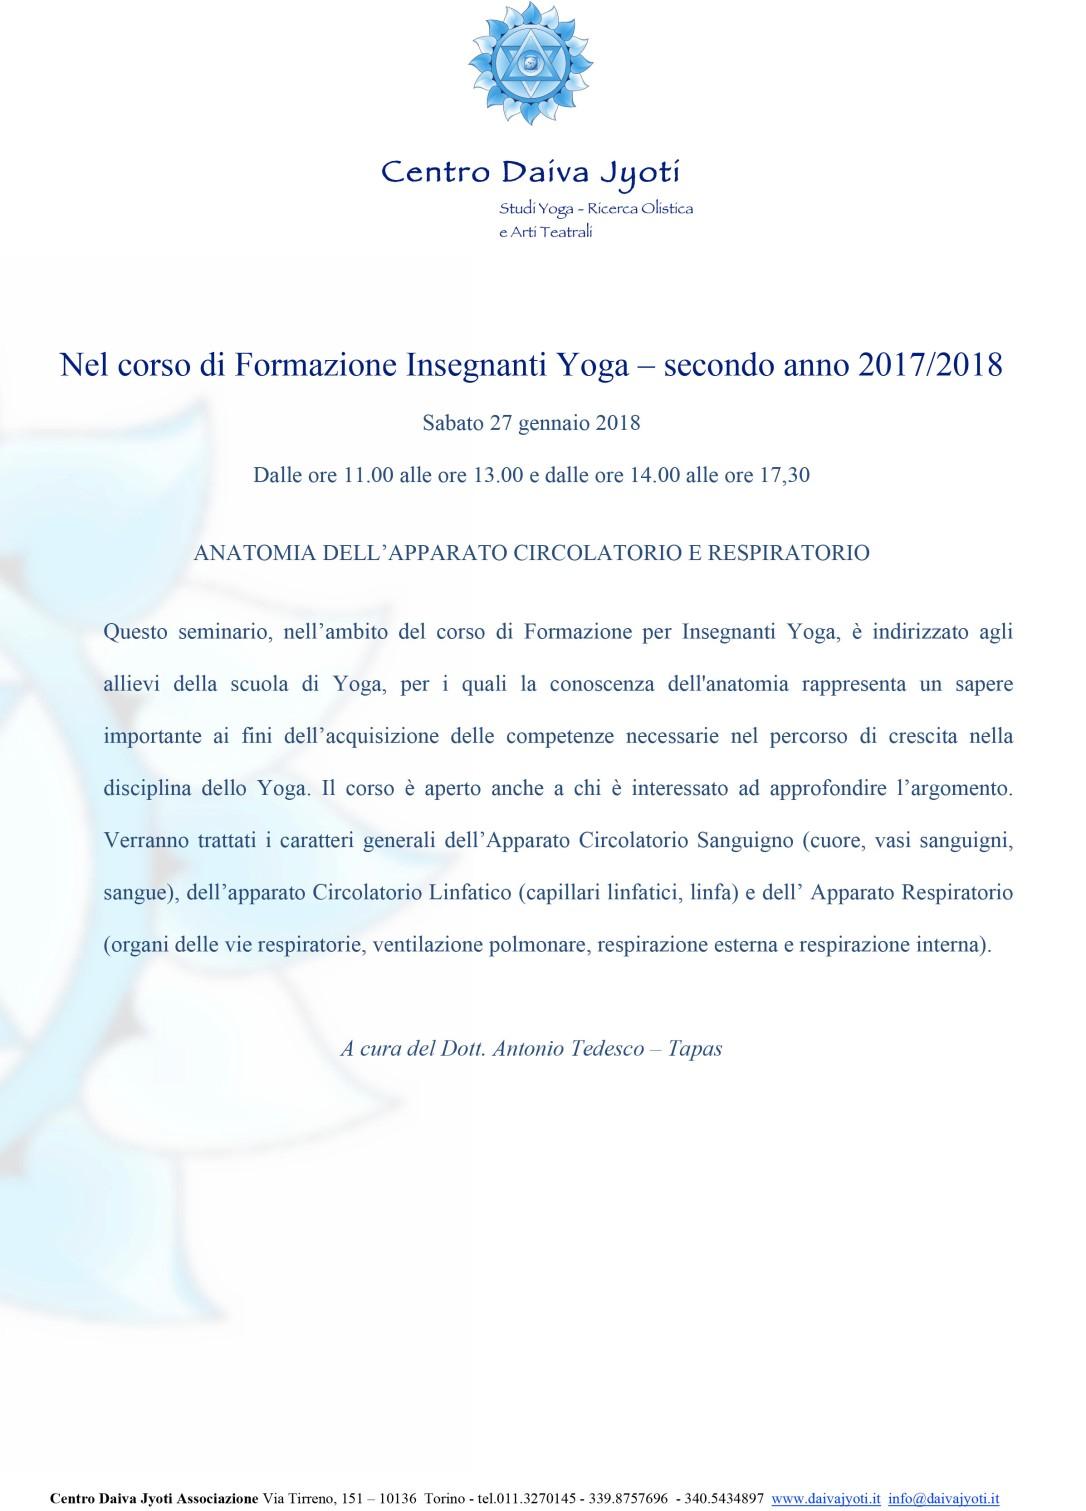 Microsoft Word - ANATOMIA 2018 SIST CIRC E RESP 27 GEN 2018.doc